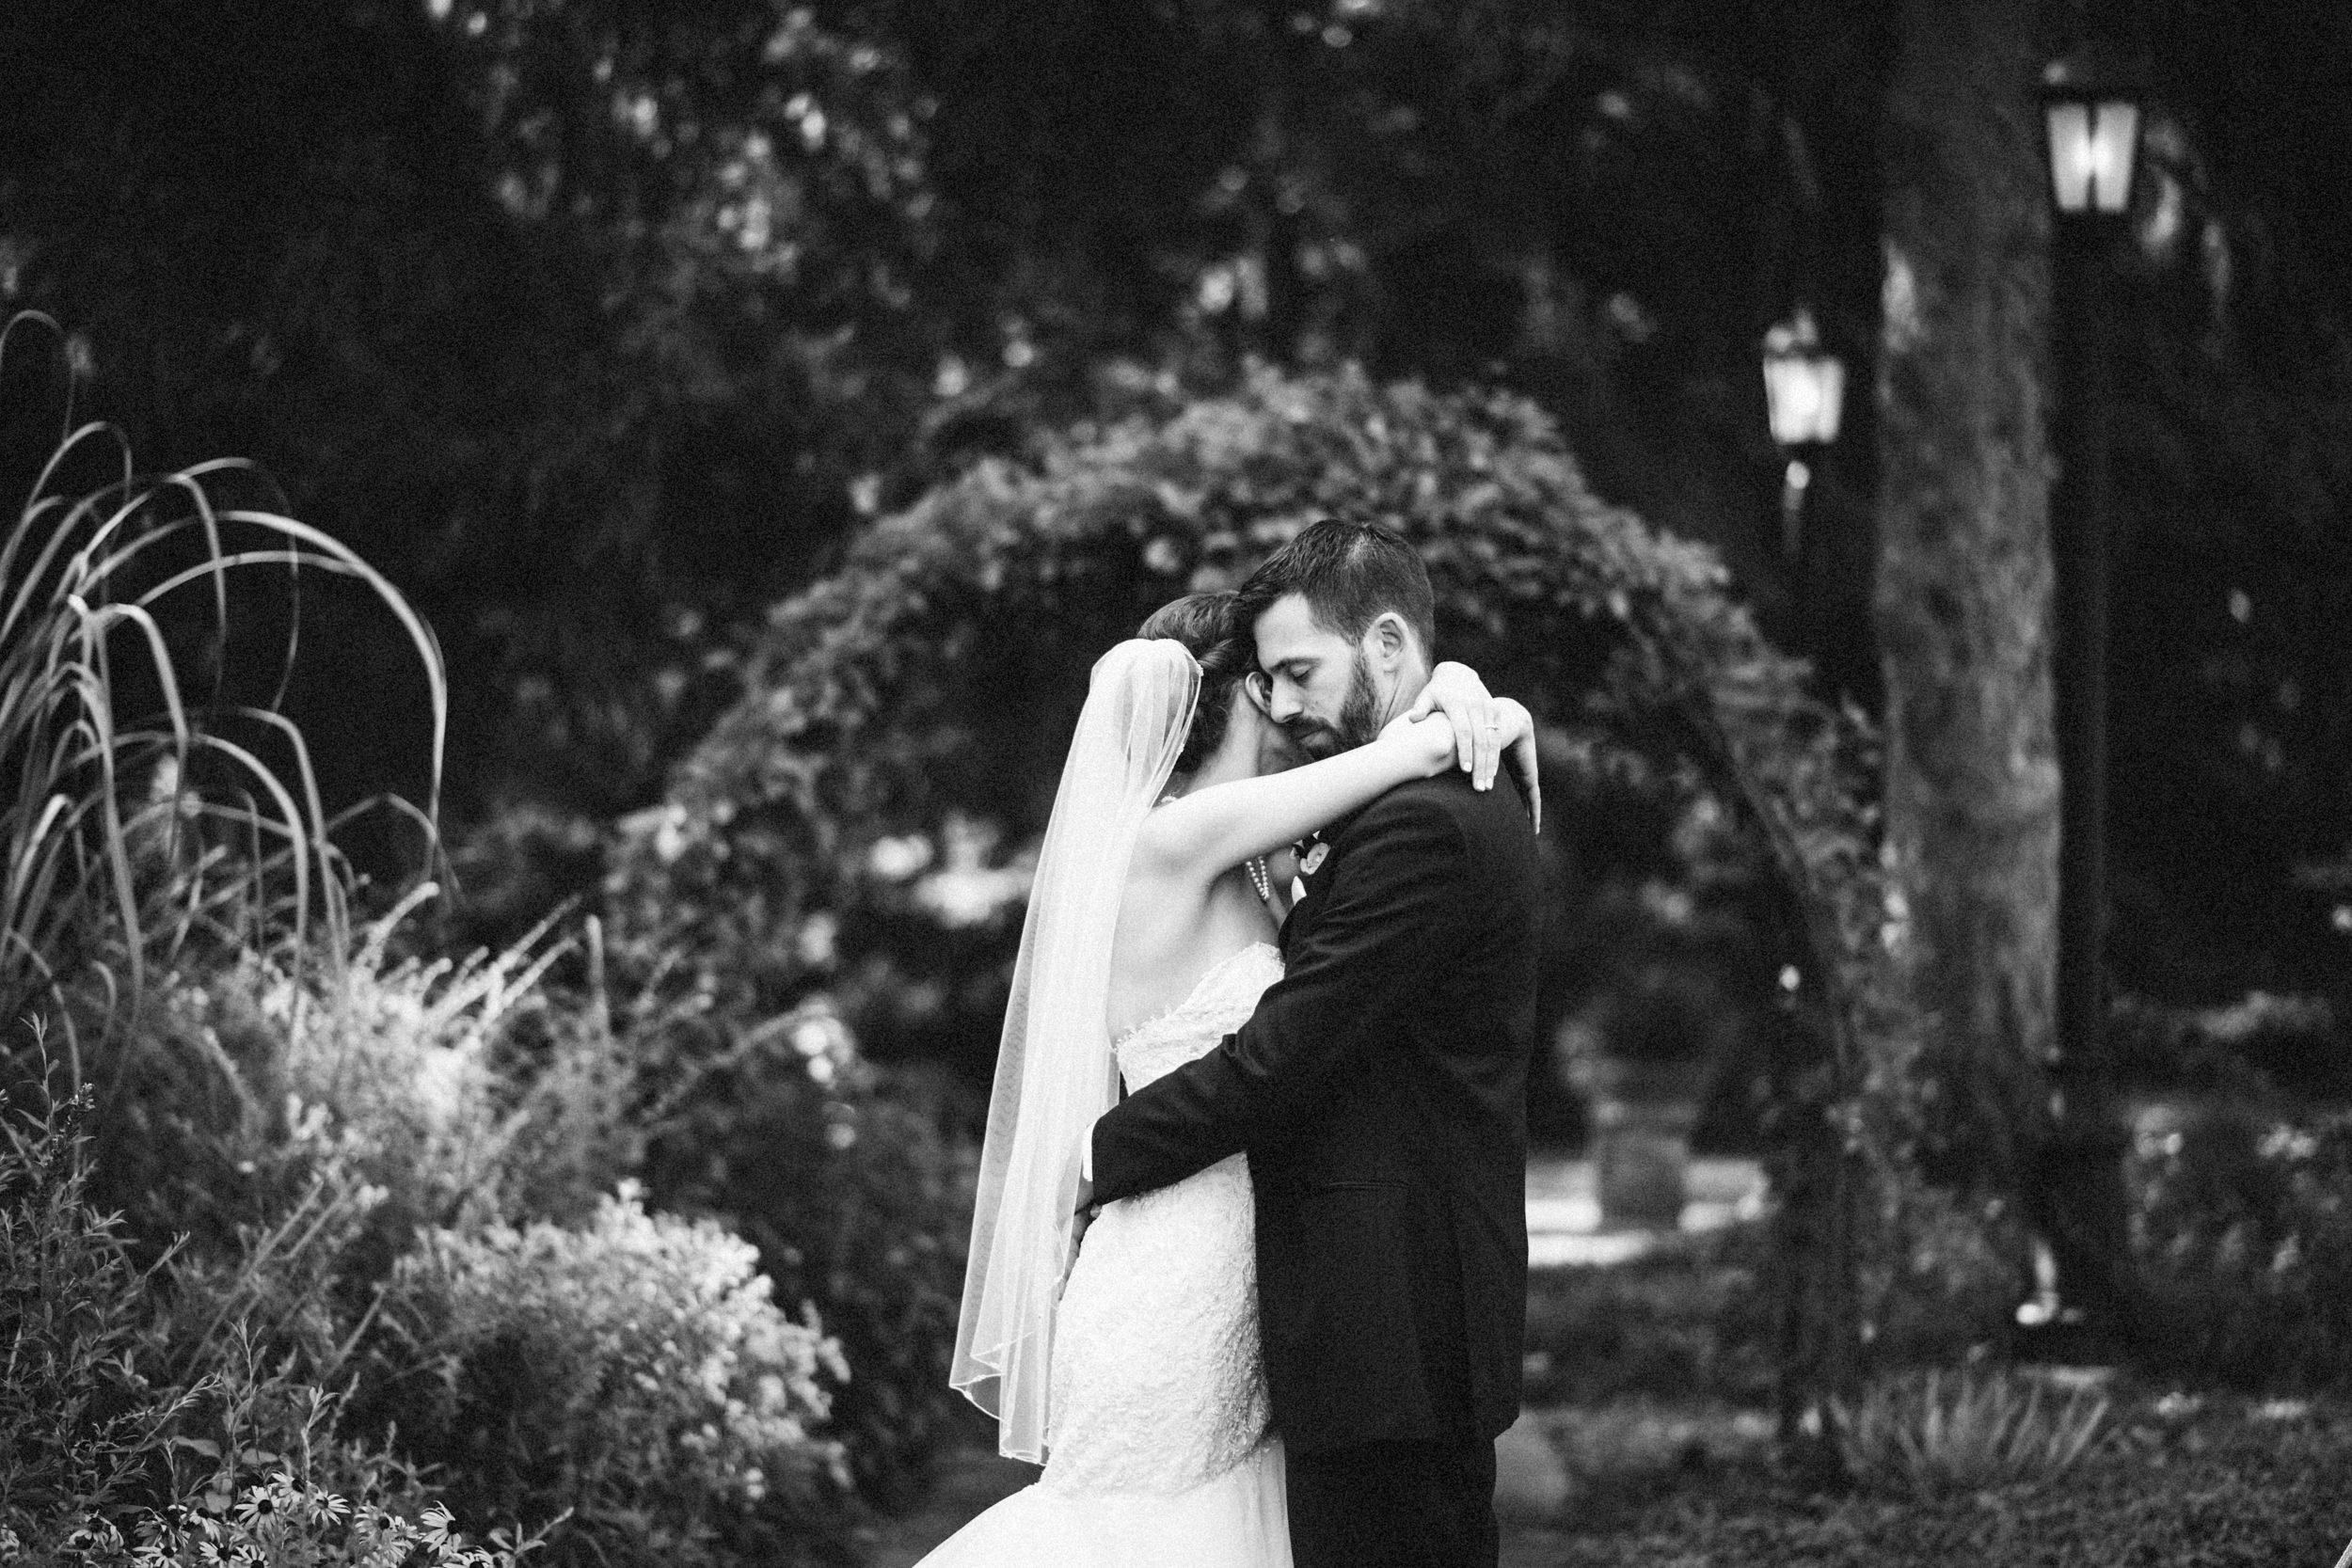 Louisville-Kentucky-Wedding-Elopement-Photographer-Sarah-Katherine-Davis-Photography-Whitehall-Classic-Timeless-Garden-Wedding-482.jpg